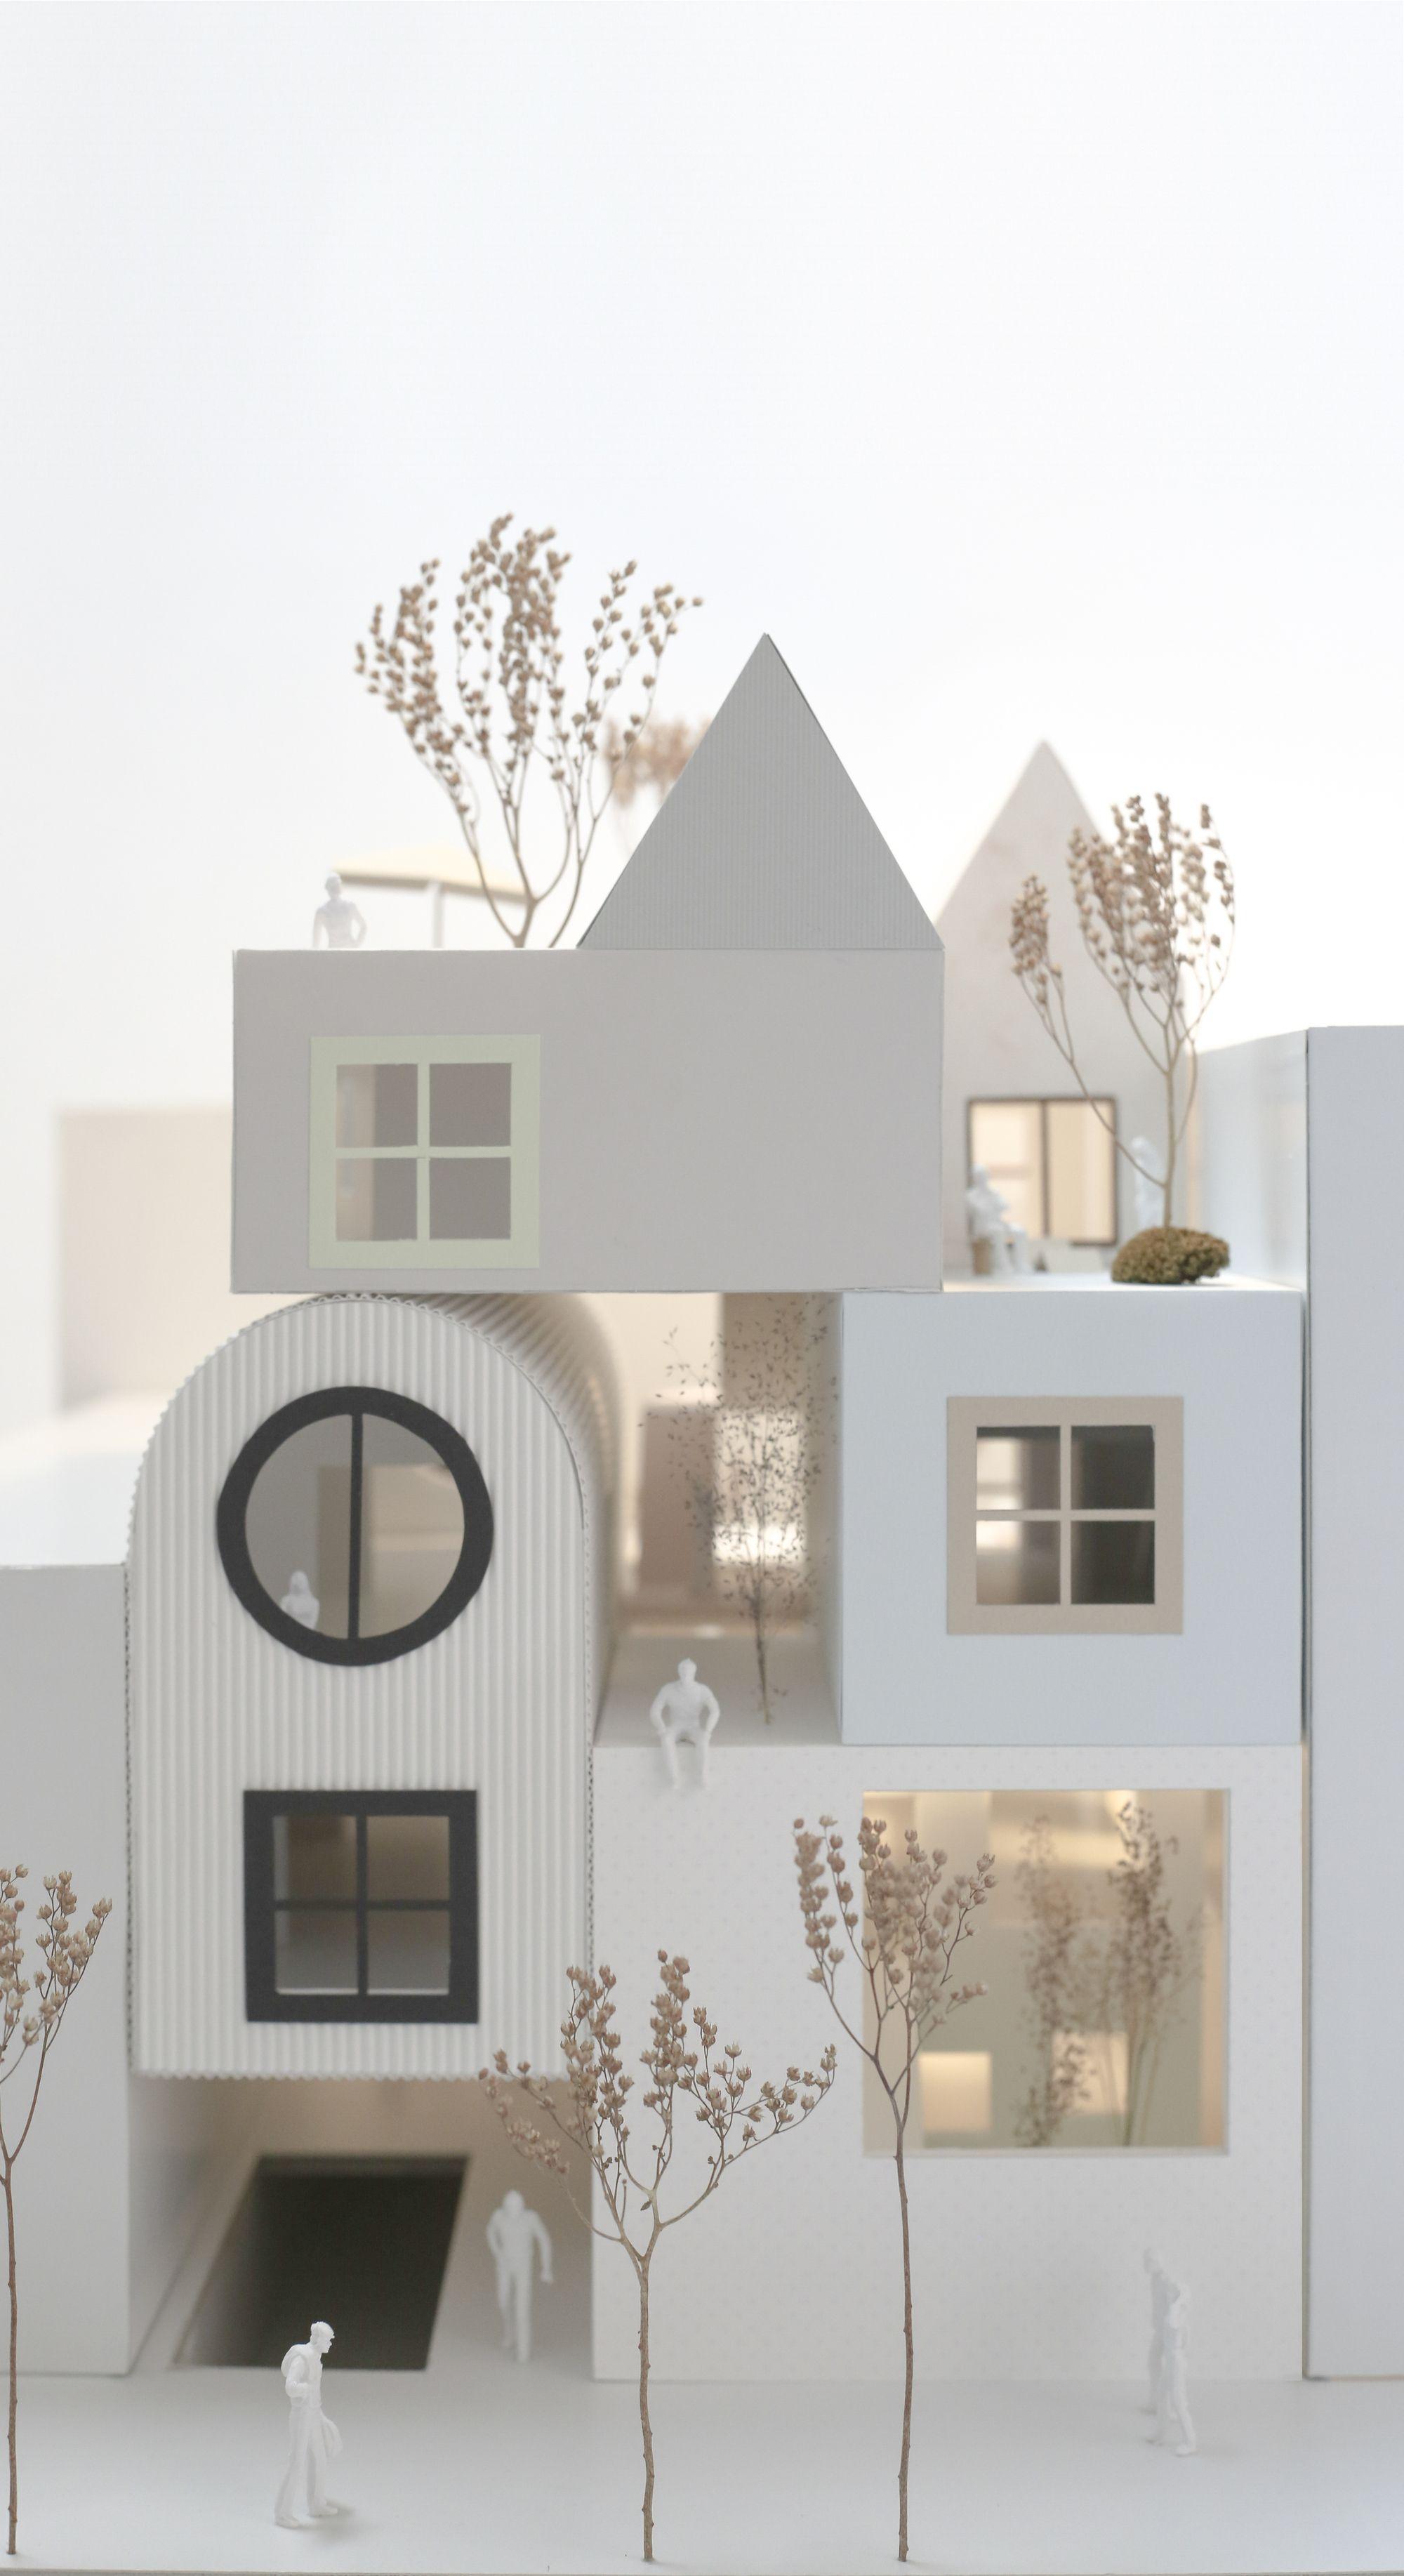 Pin by Mahdieh Nasiri on Architecture/model | Pinterest | Models ...